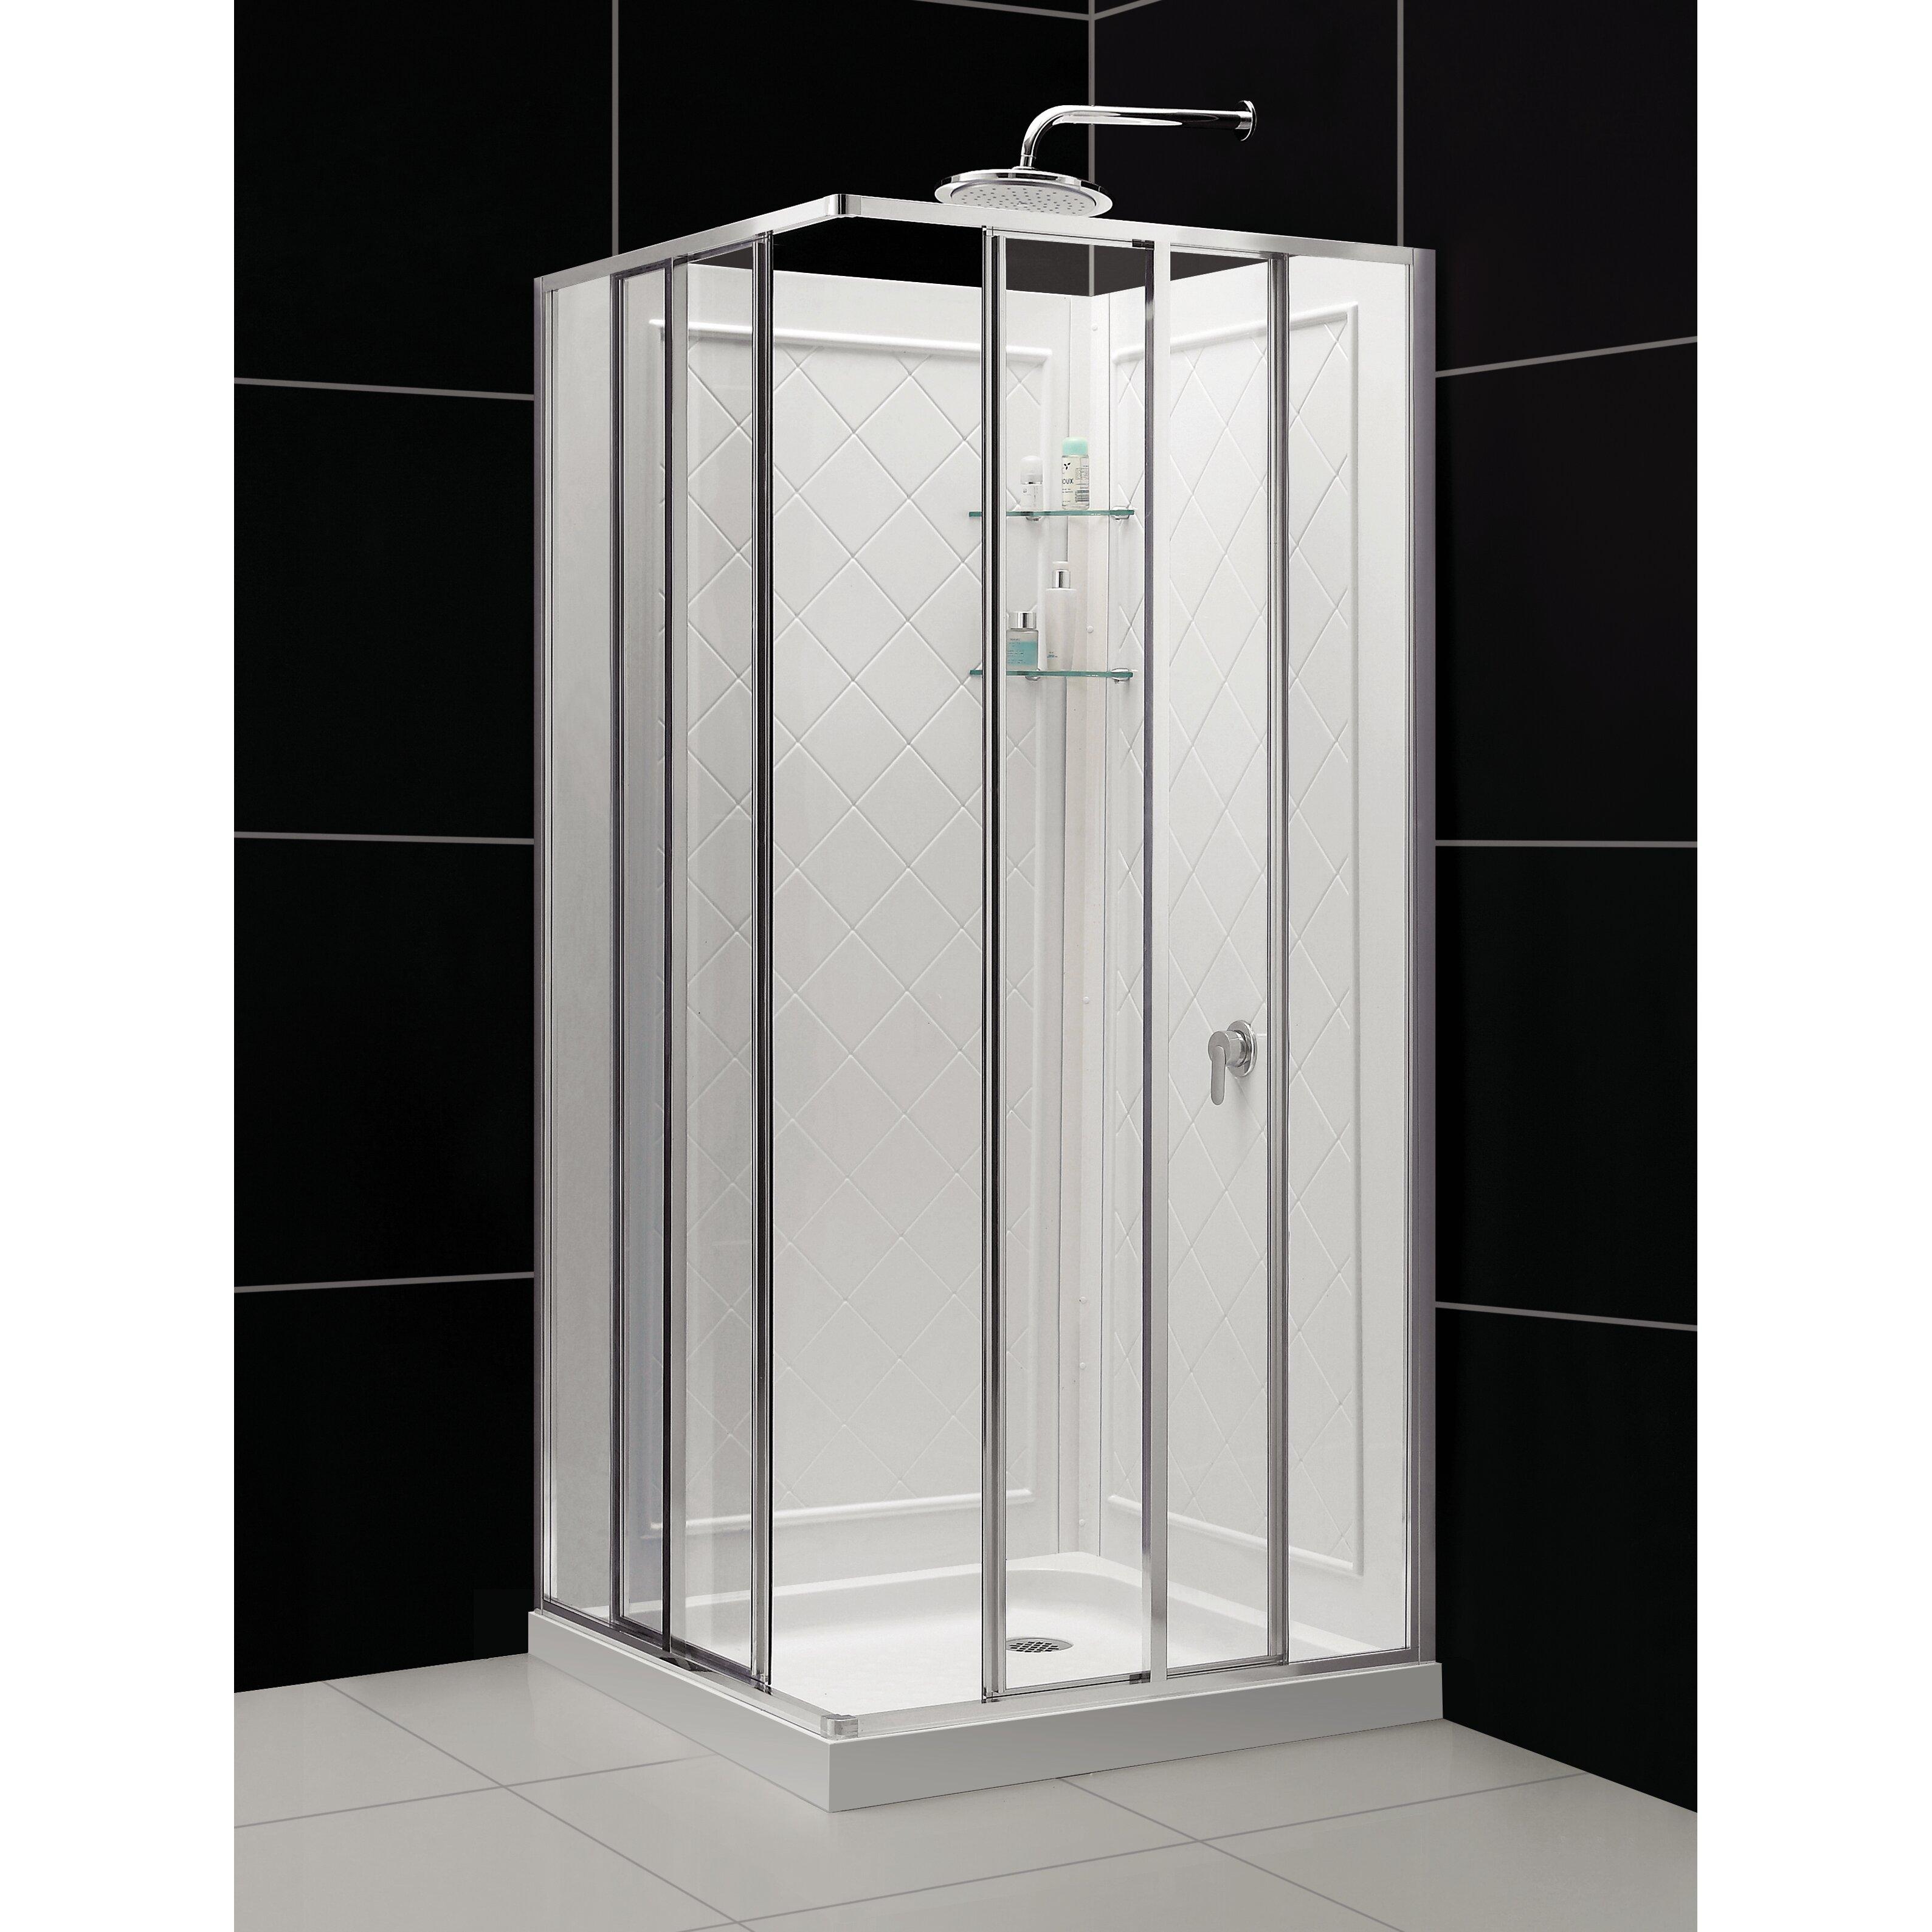 DreamLine Cornerview 34 5 X 34 5 X 72 Square Sliding Shower